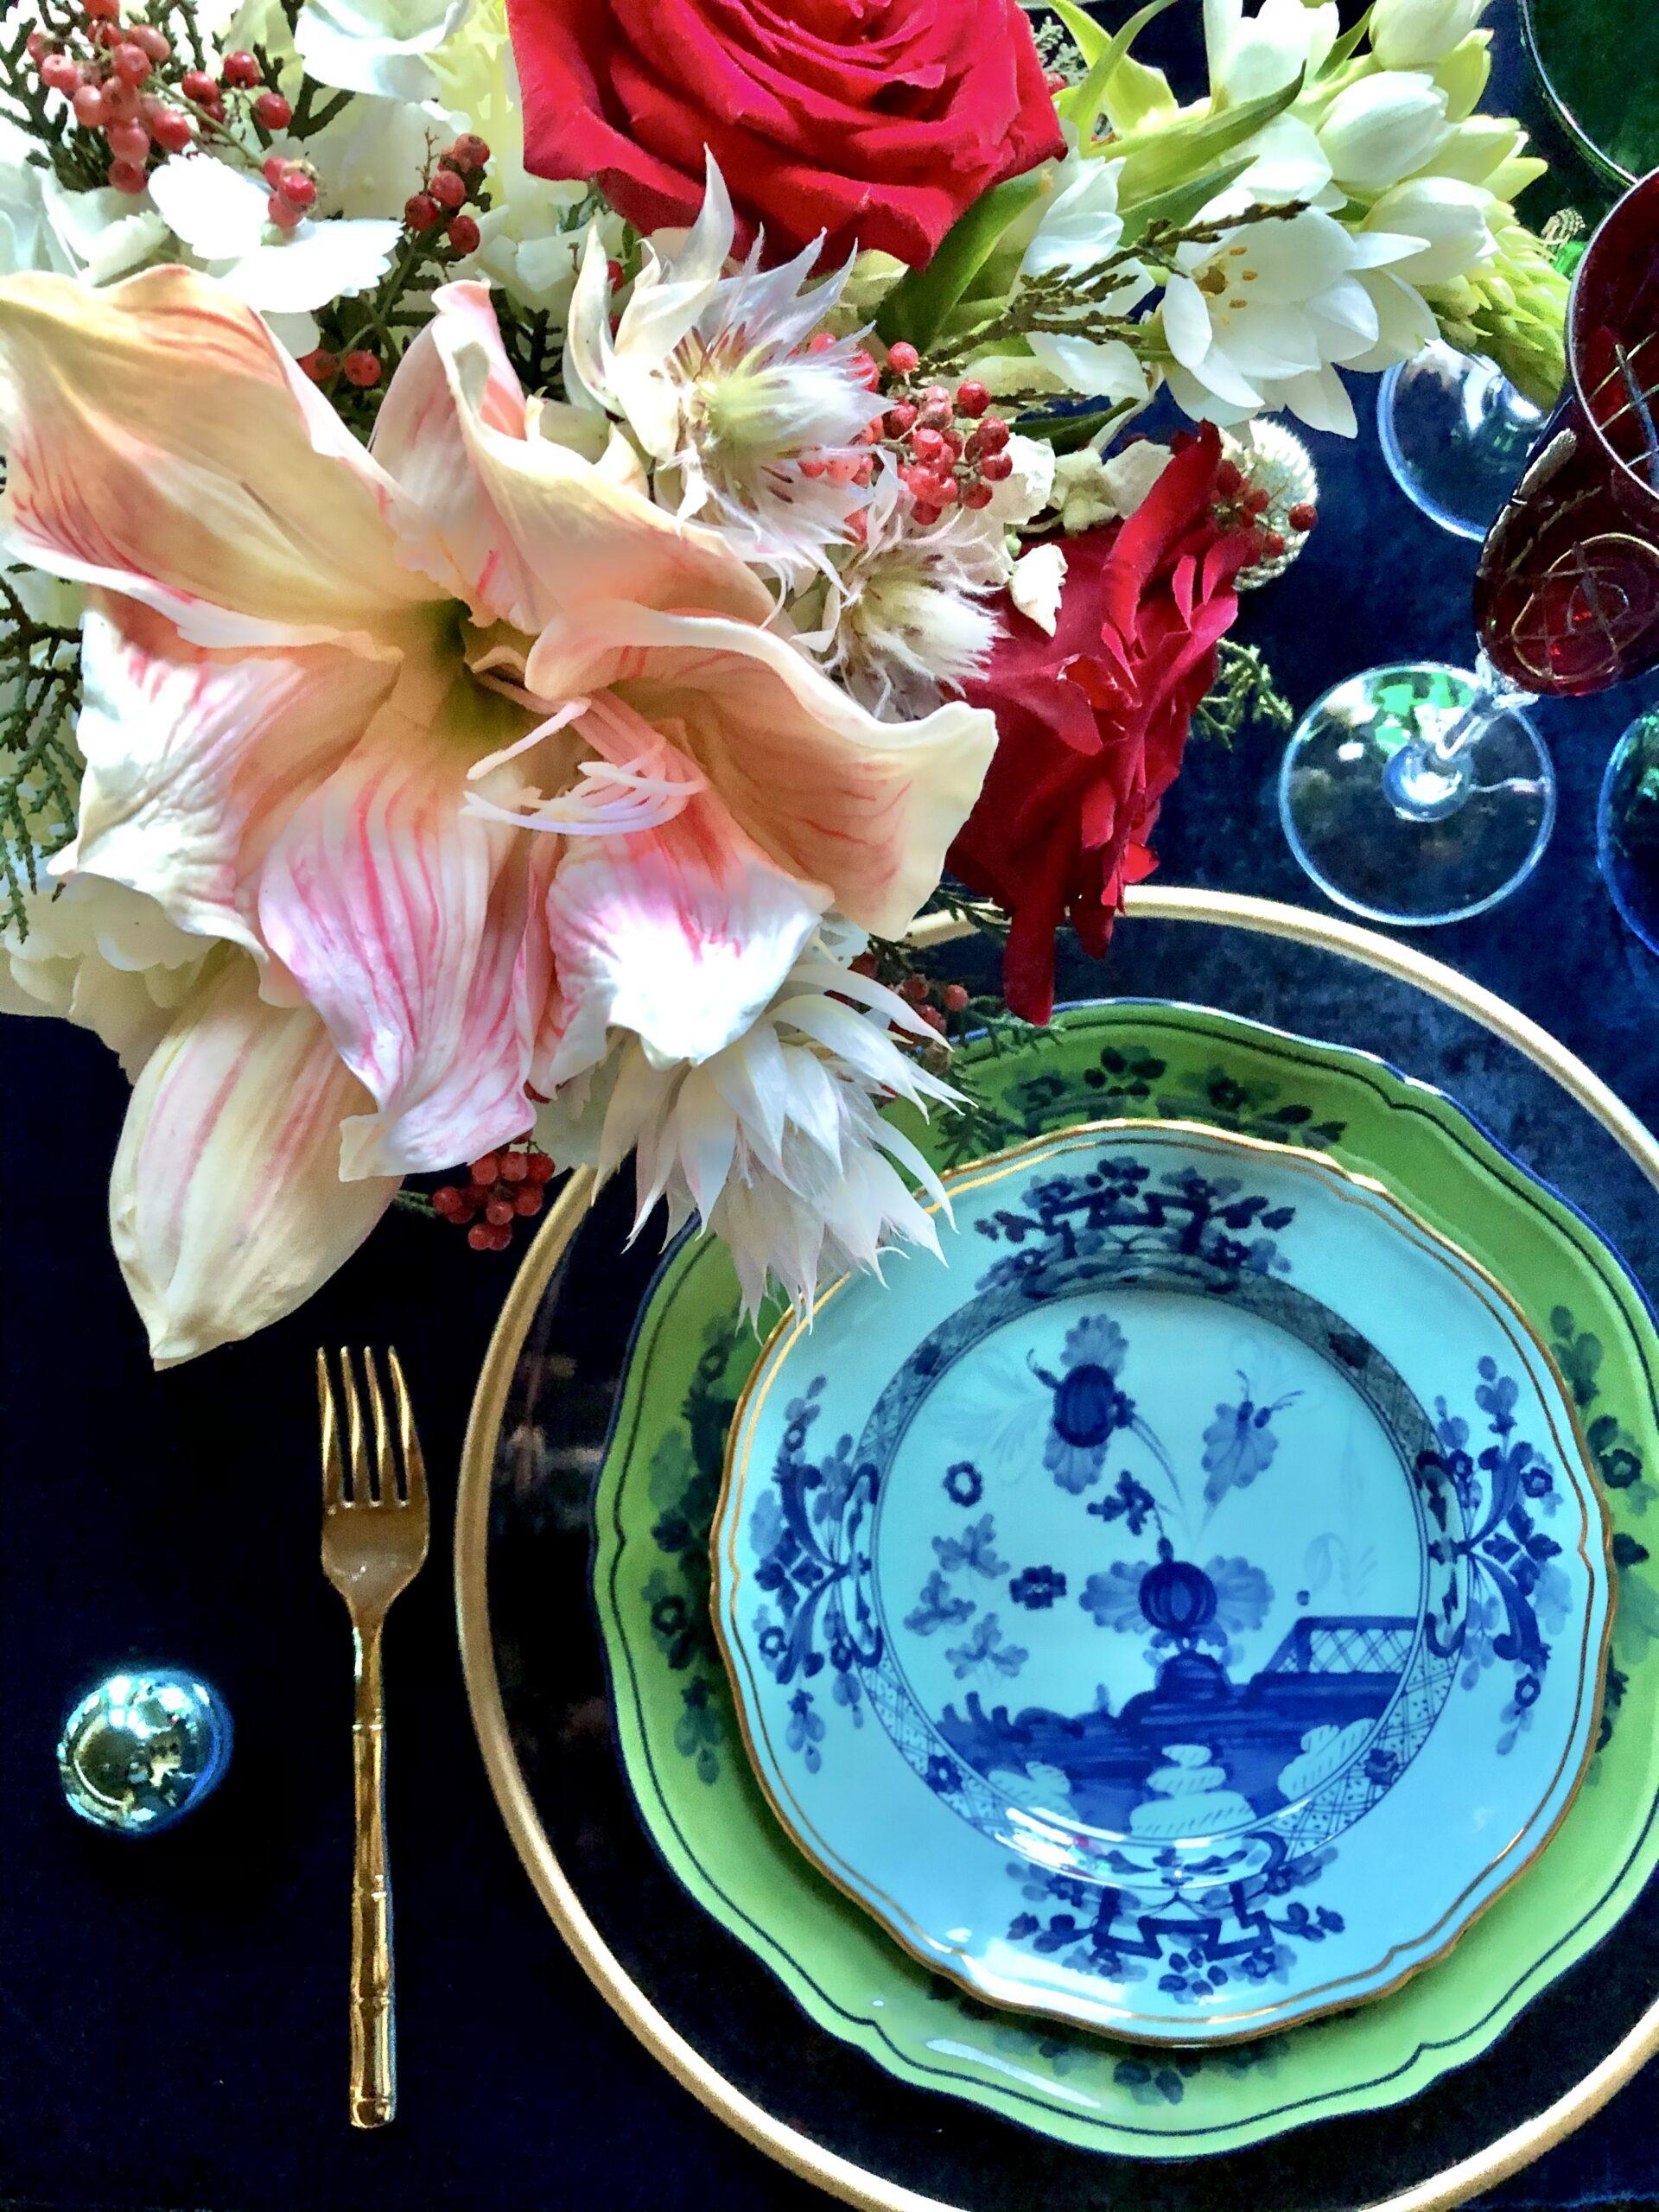 Christmas Table, Richard Ginori Oriente Italiano turquoise and Azur